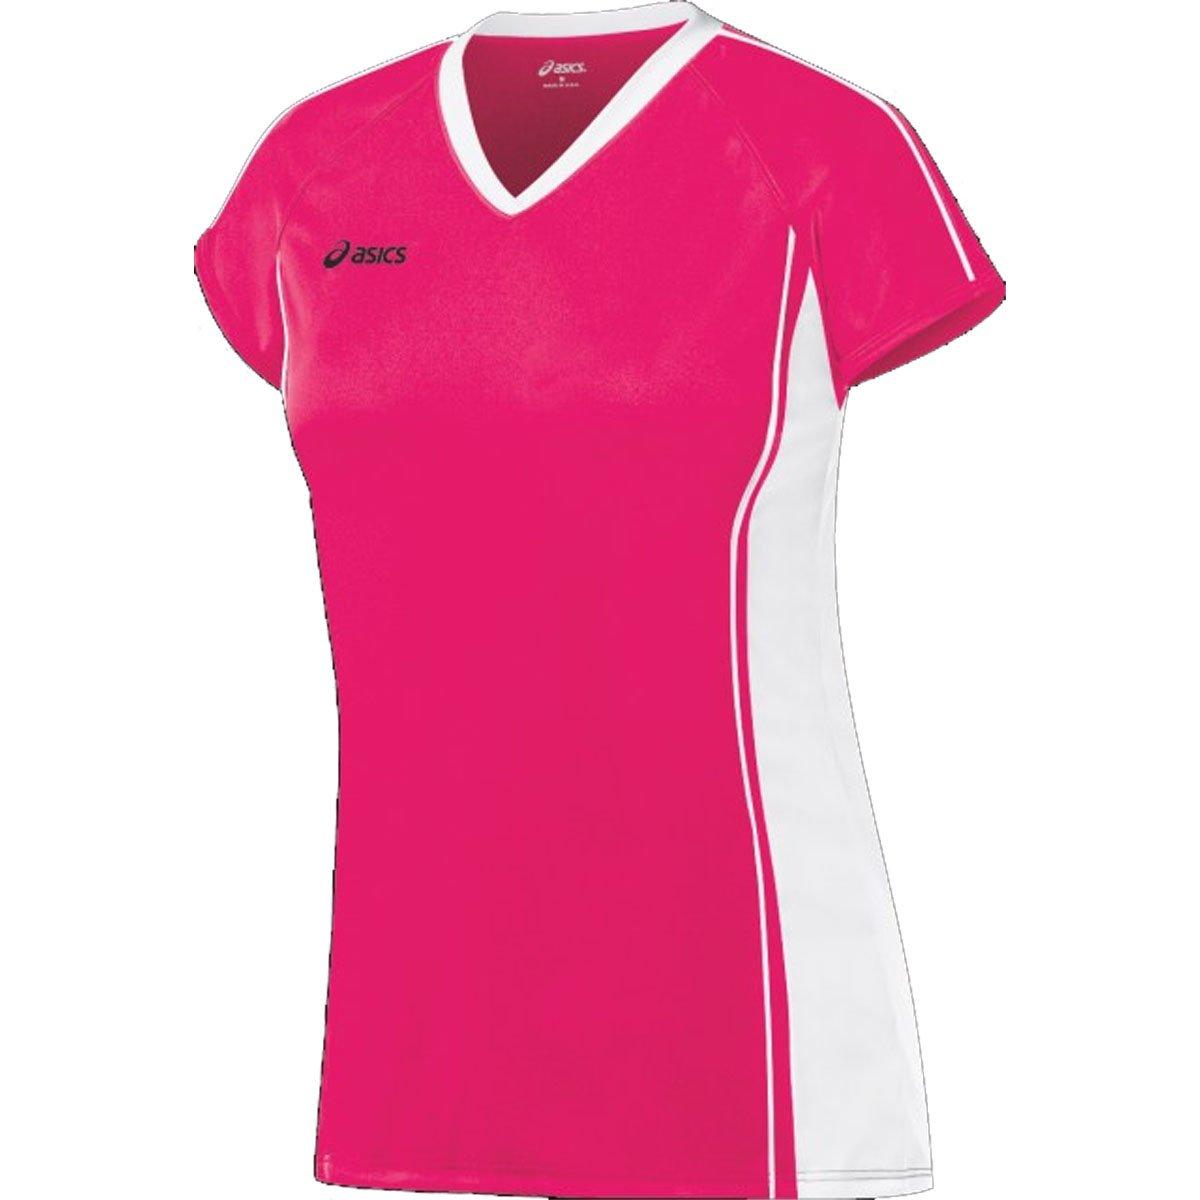 Asics Damen Replay Jersey, Damen, Rhapsody Weiß, Small Small Small B005AD4A0I Shirts & Blausen Neu 9bfcb9